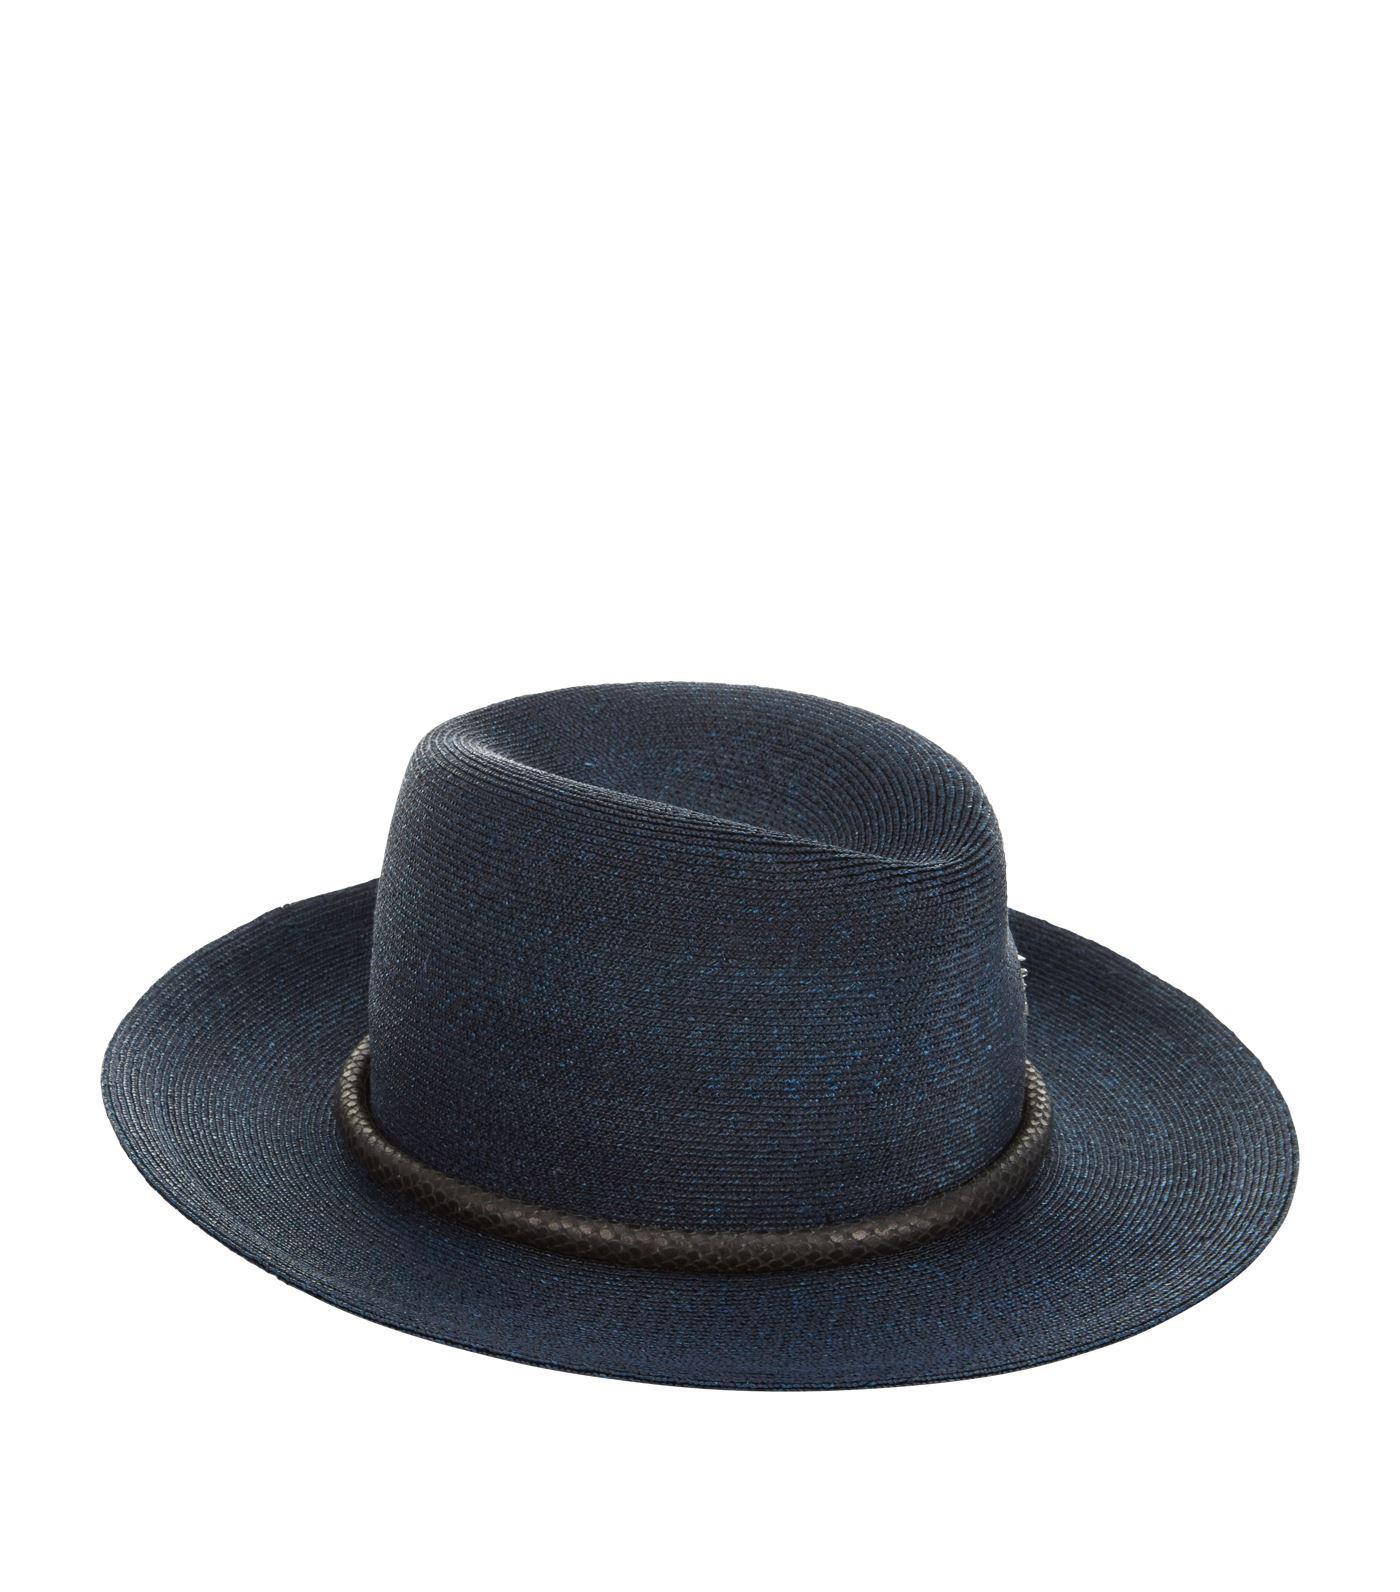 Lyst - Philip Treacy Snakeskin Trim Trilby Hat in Blue for Men 2f27584247cf